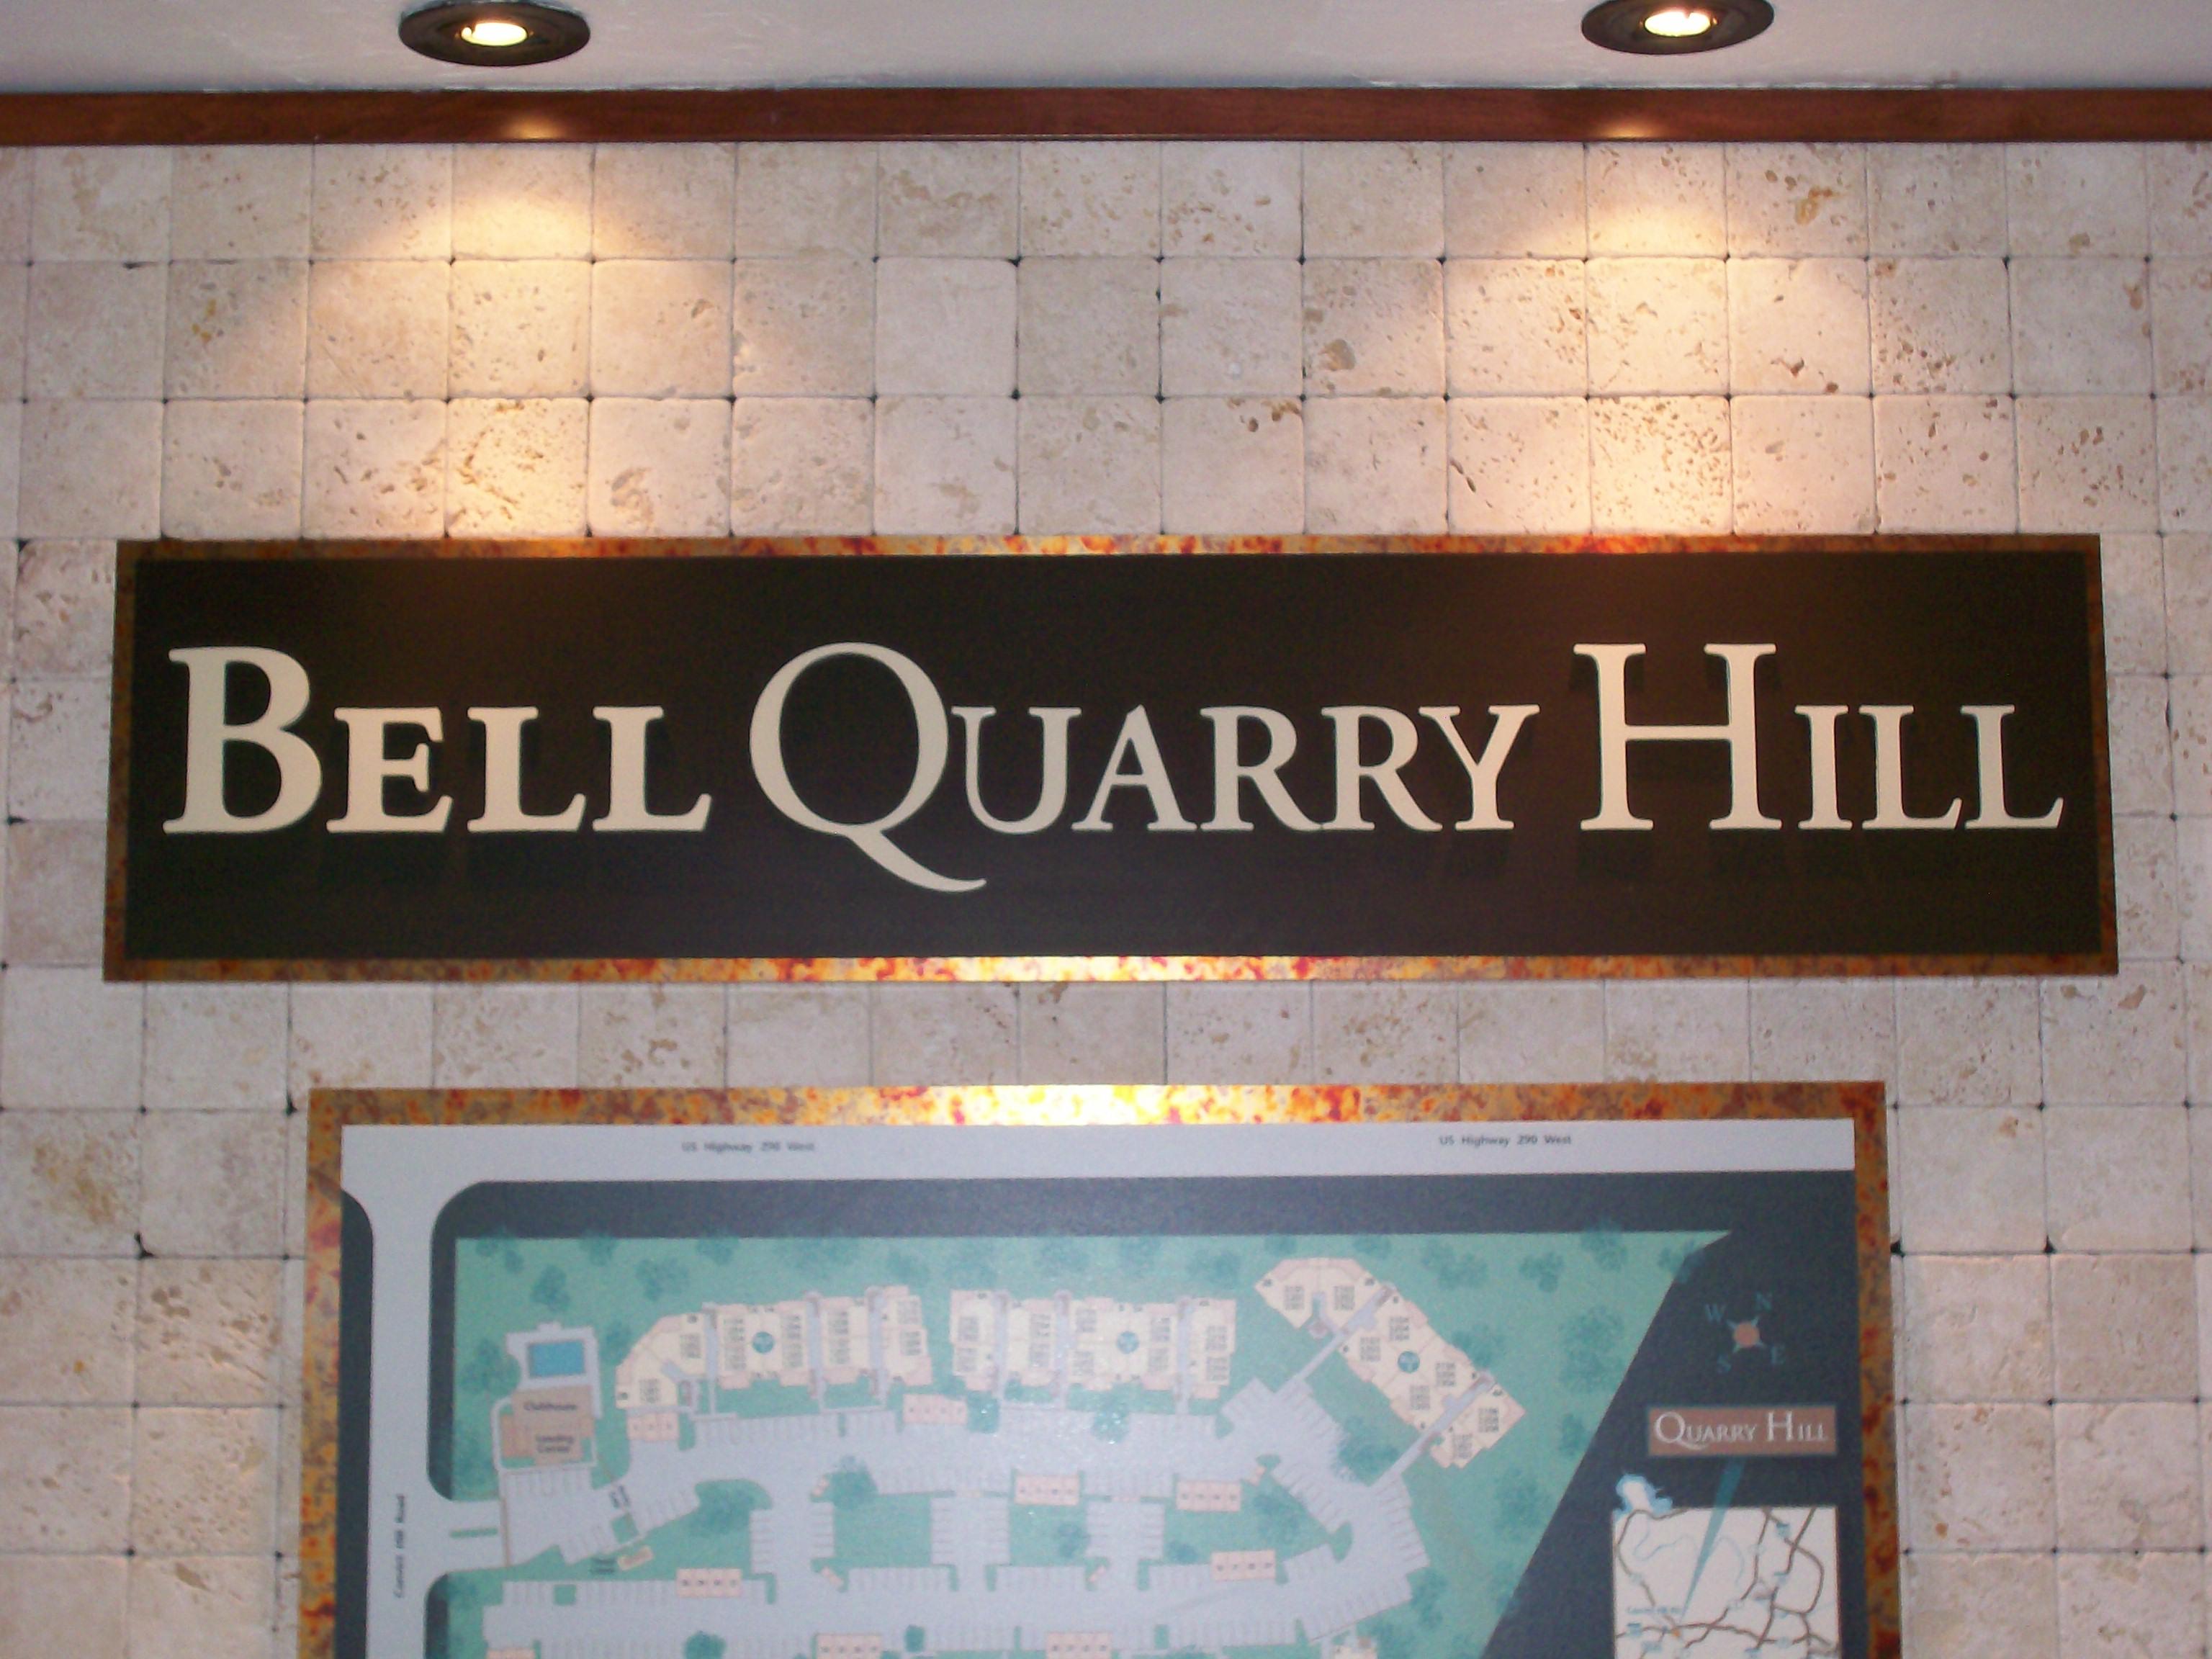 Bell Quarry Hill - lk27145 - 3.JPG